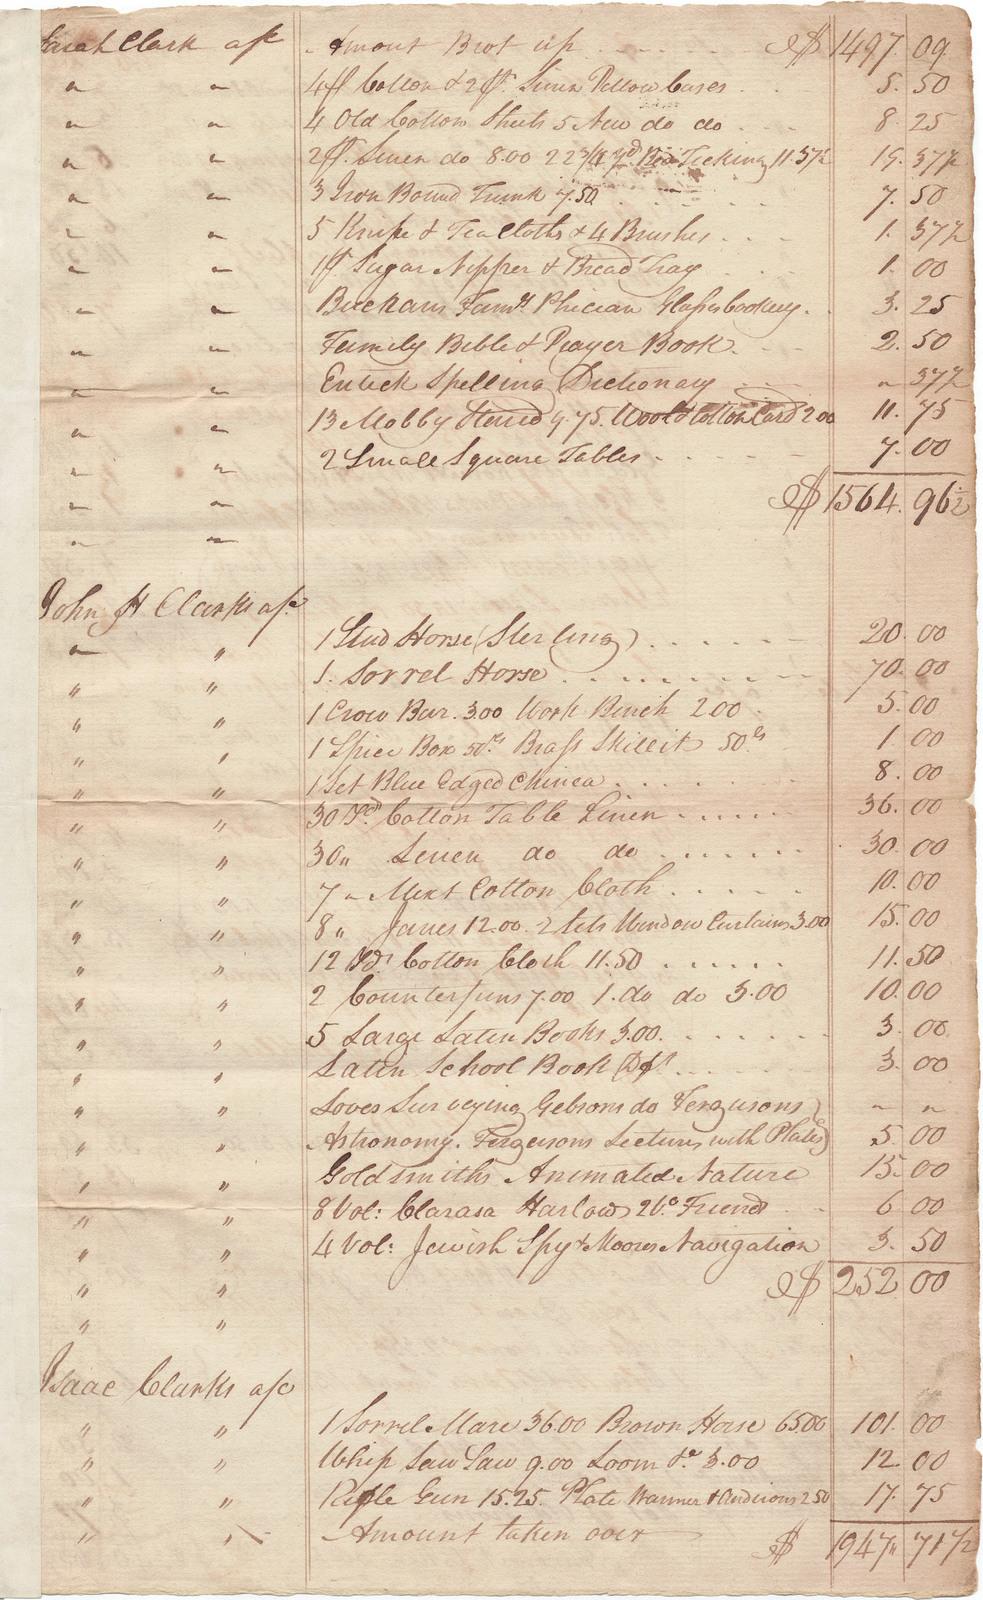 Jonathan Clark's estate sale list